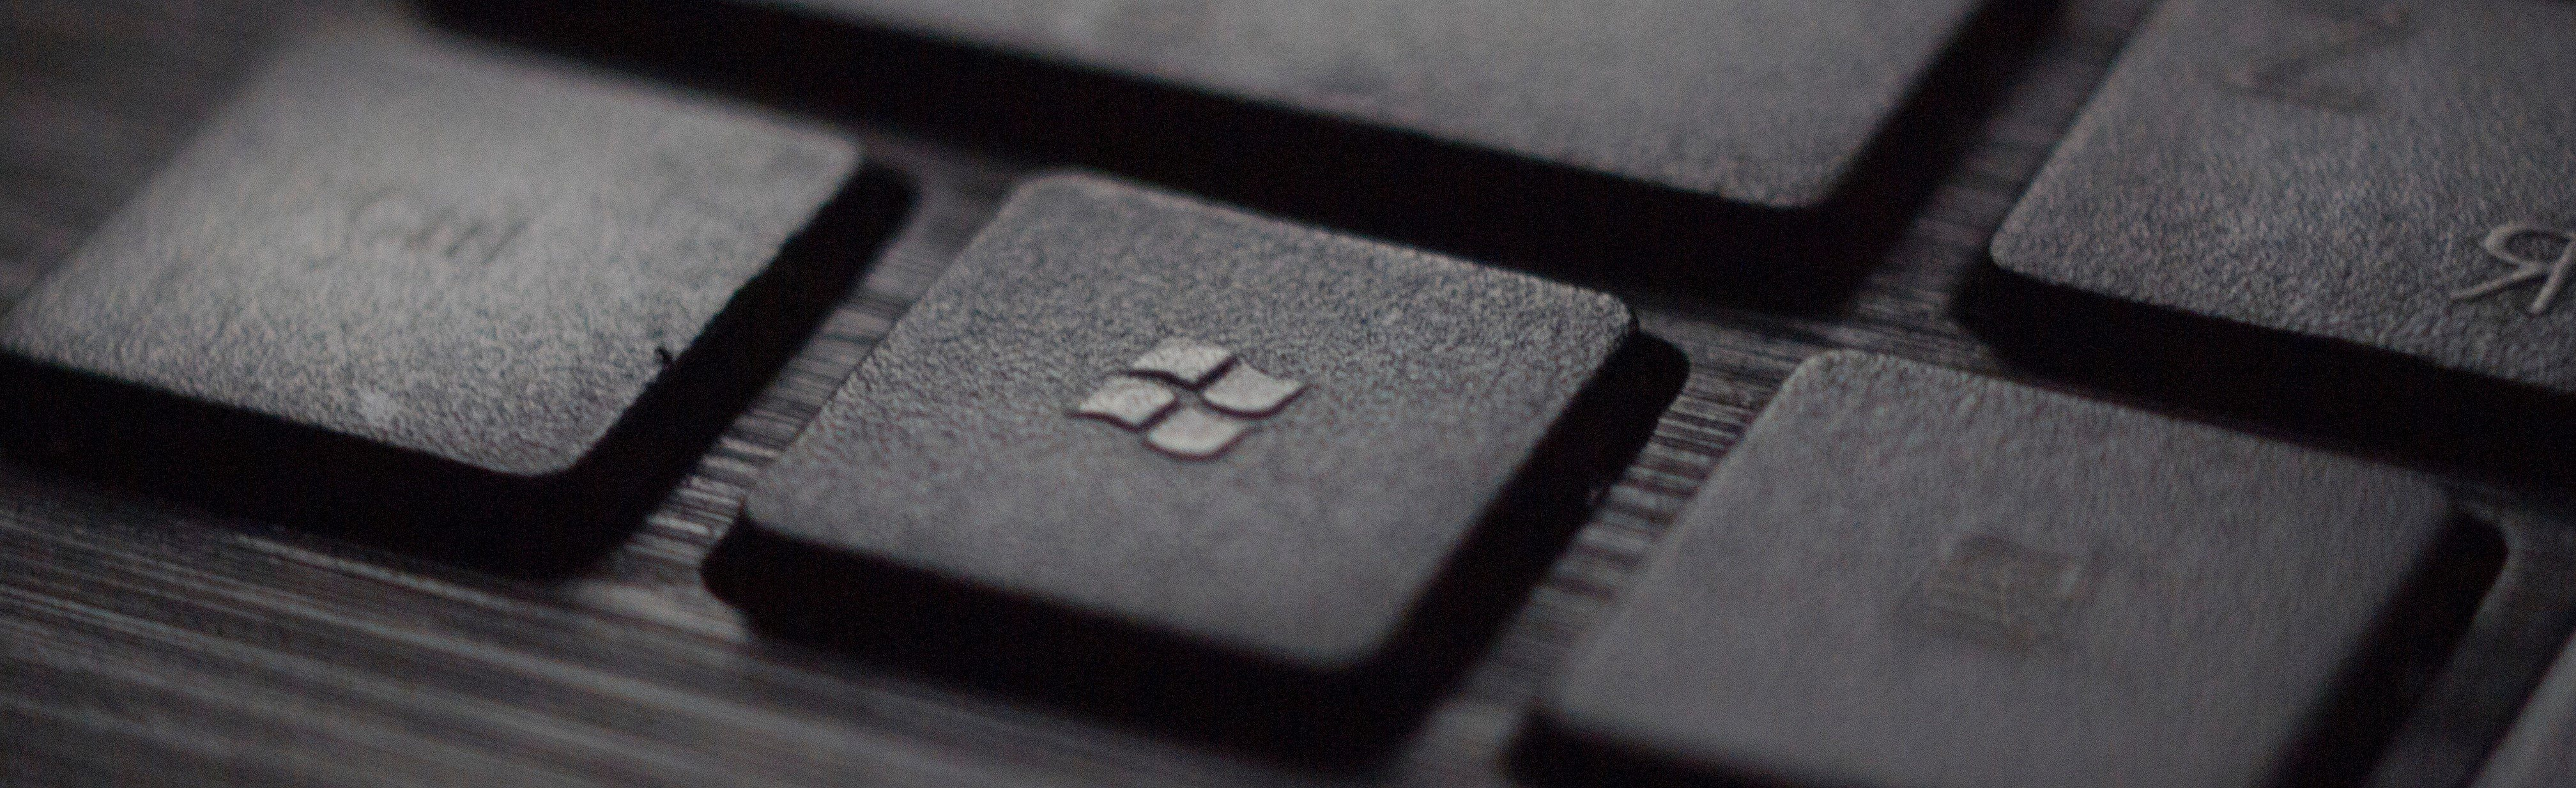 6 hidden tricks inside Windows 10 | Virtuoso